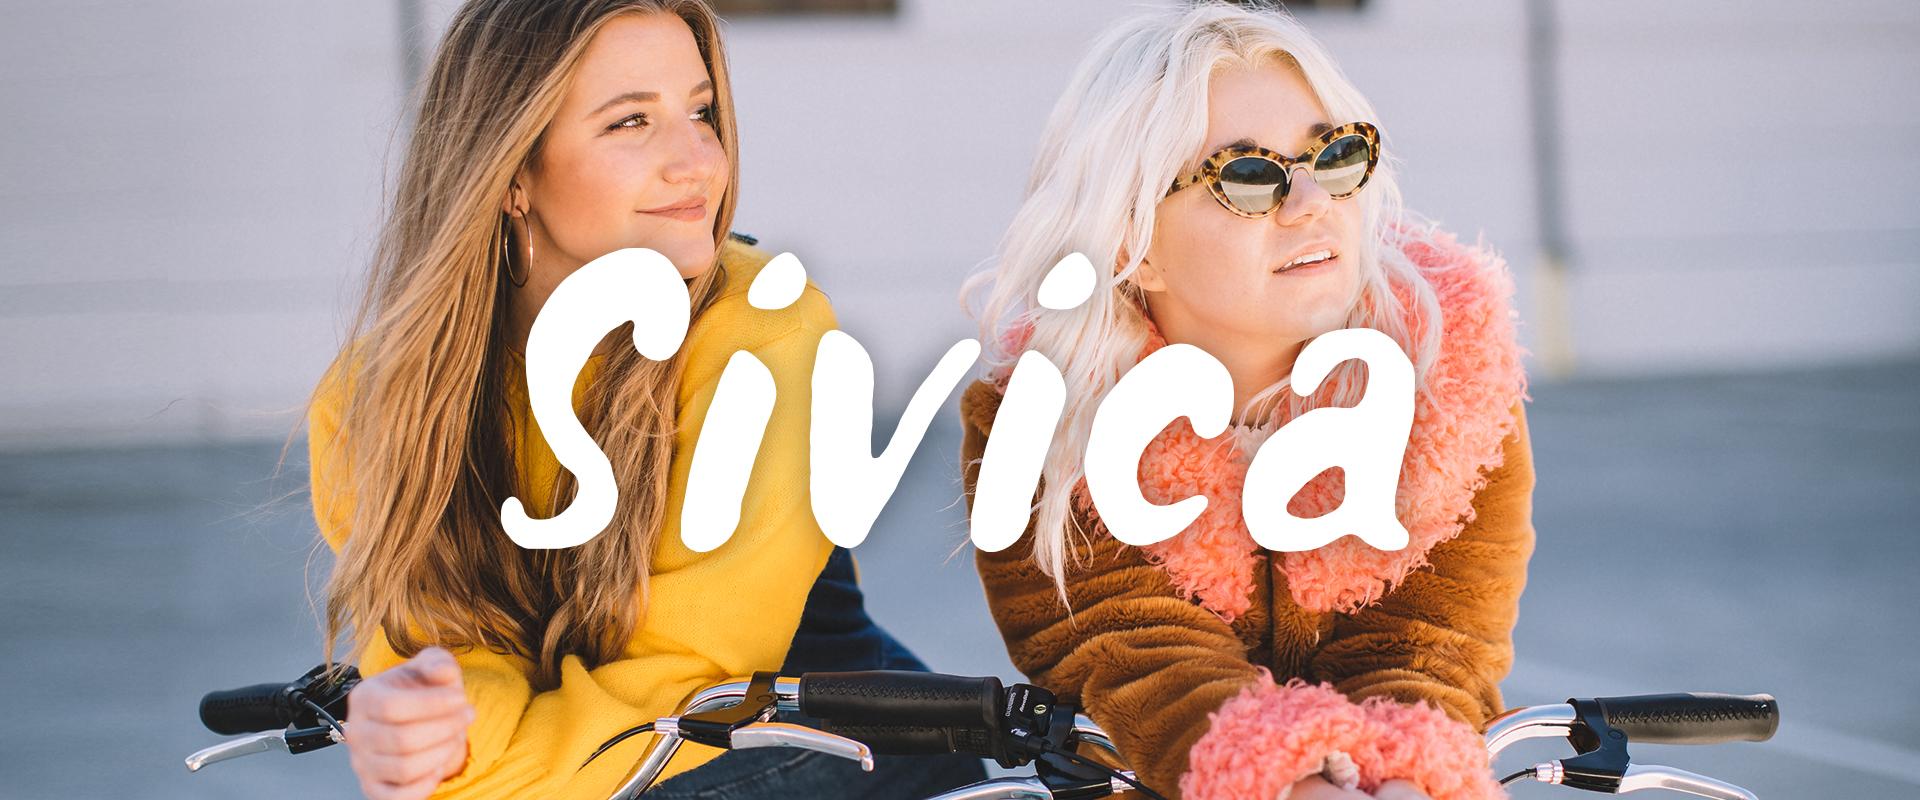 Sivica_Hero-1.jpg